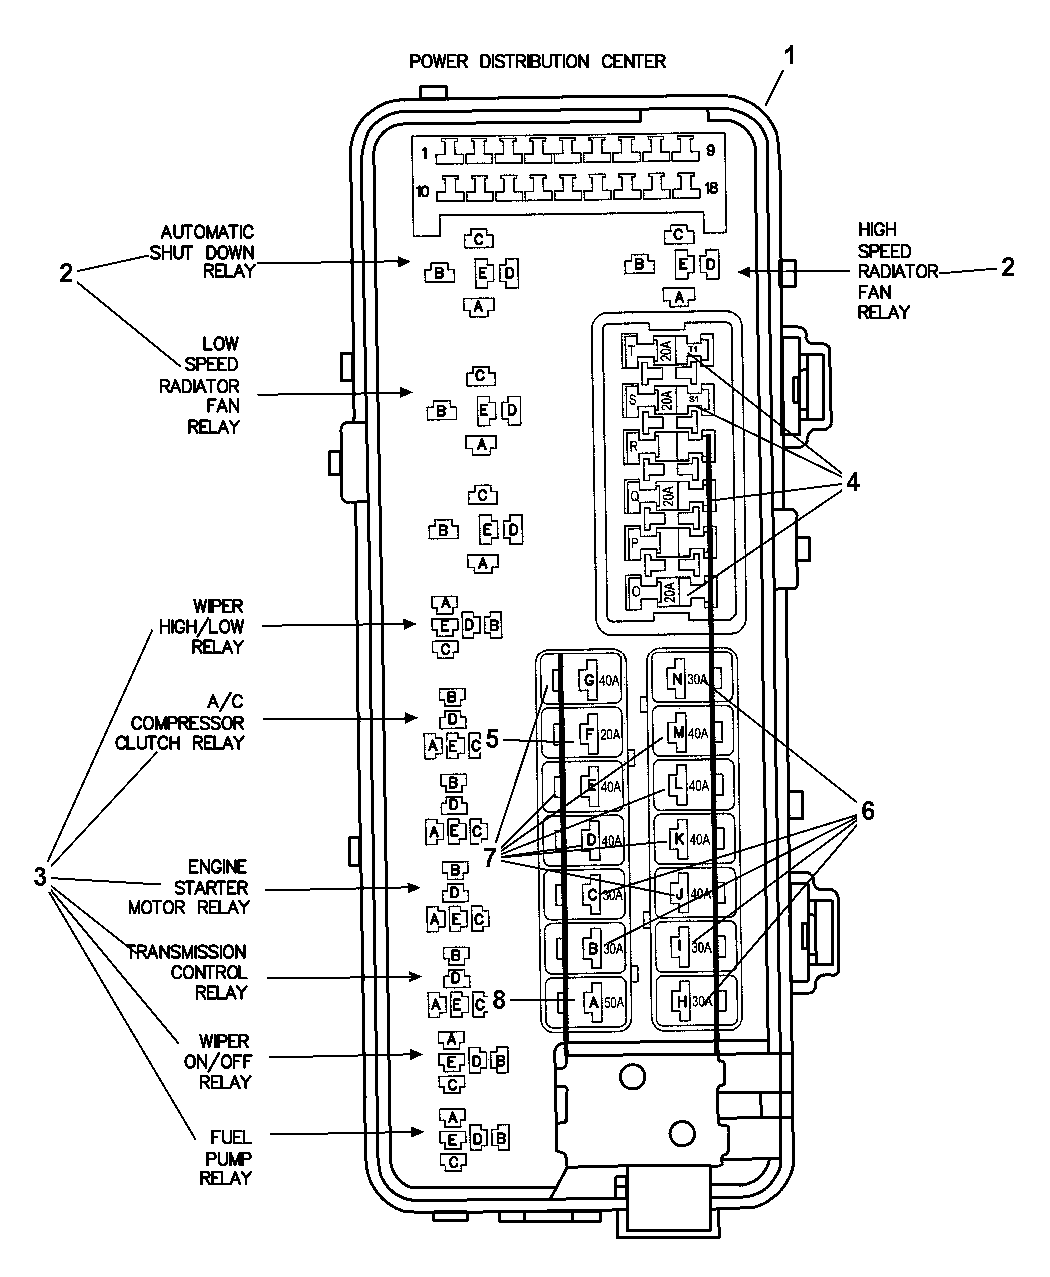 Wiring Diagram For Radiator Fan Relay